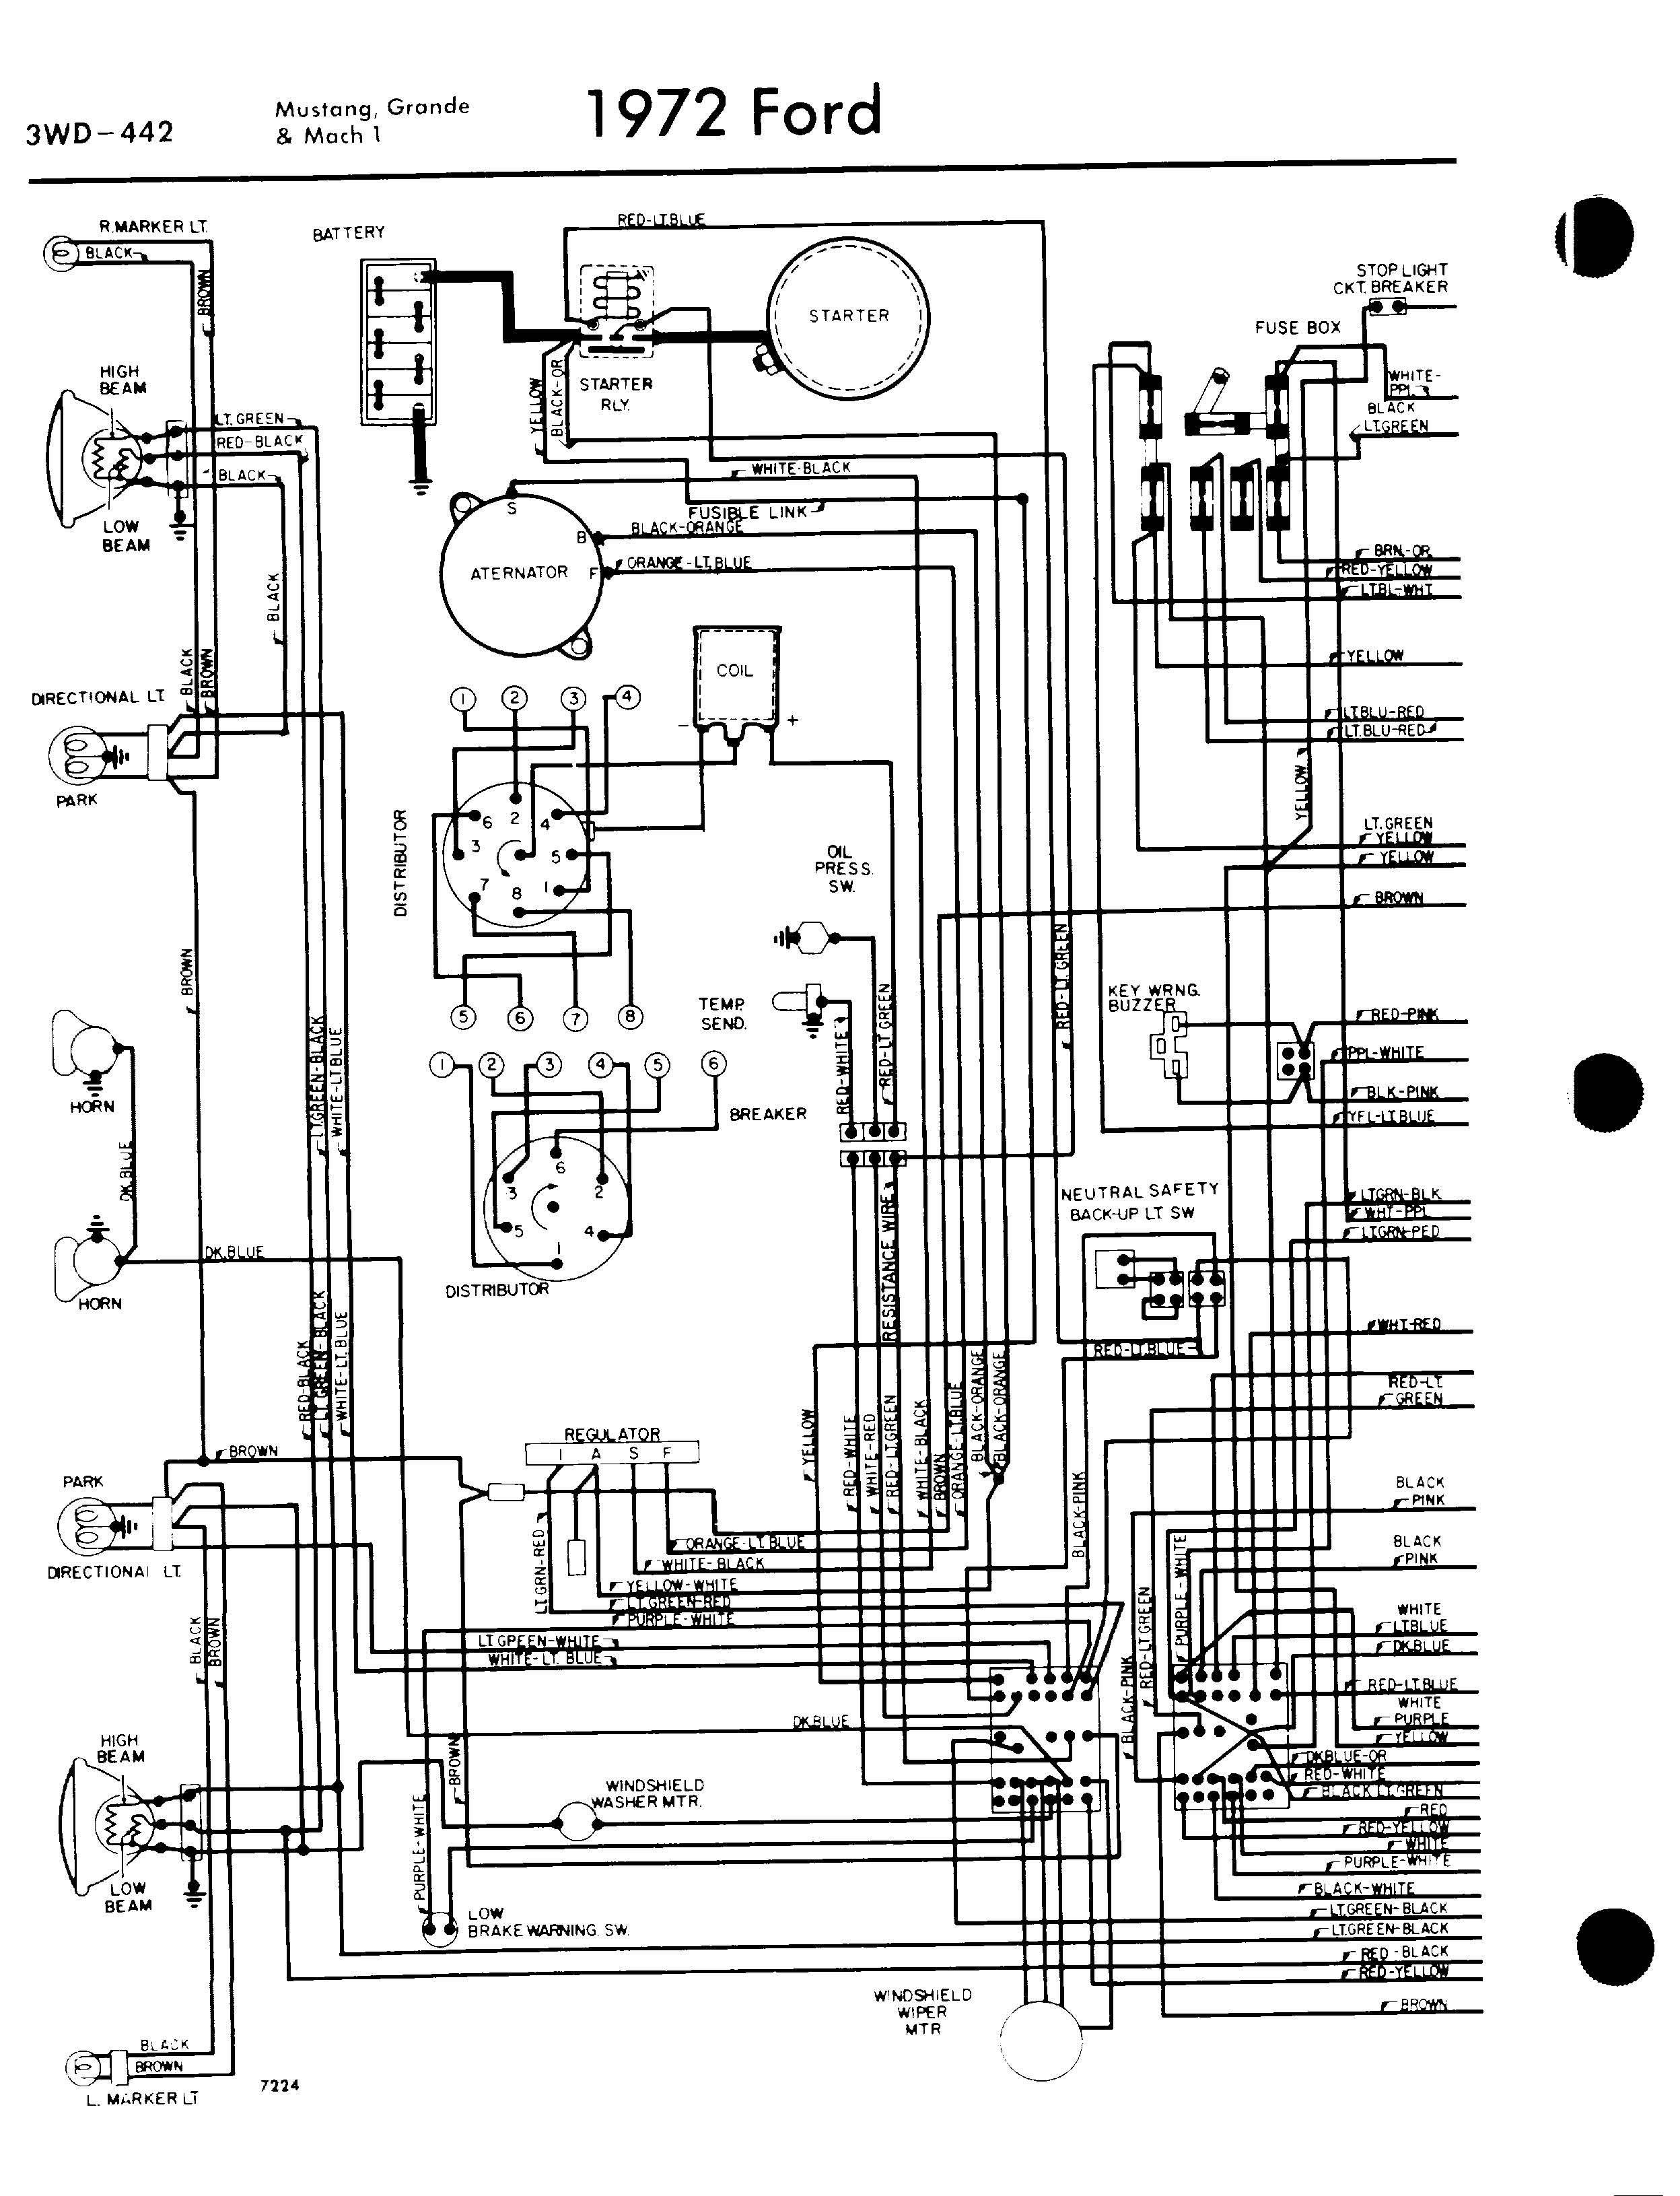 72 mach1 alternator wire harness diagram  Yahoo Search Results Yahoo Image Search Results | Mach 1